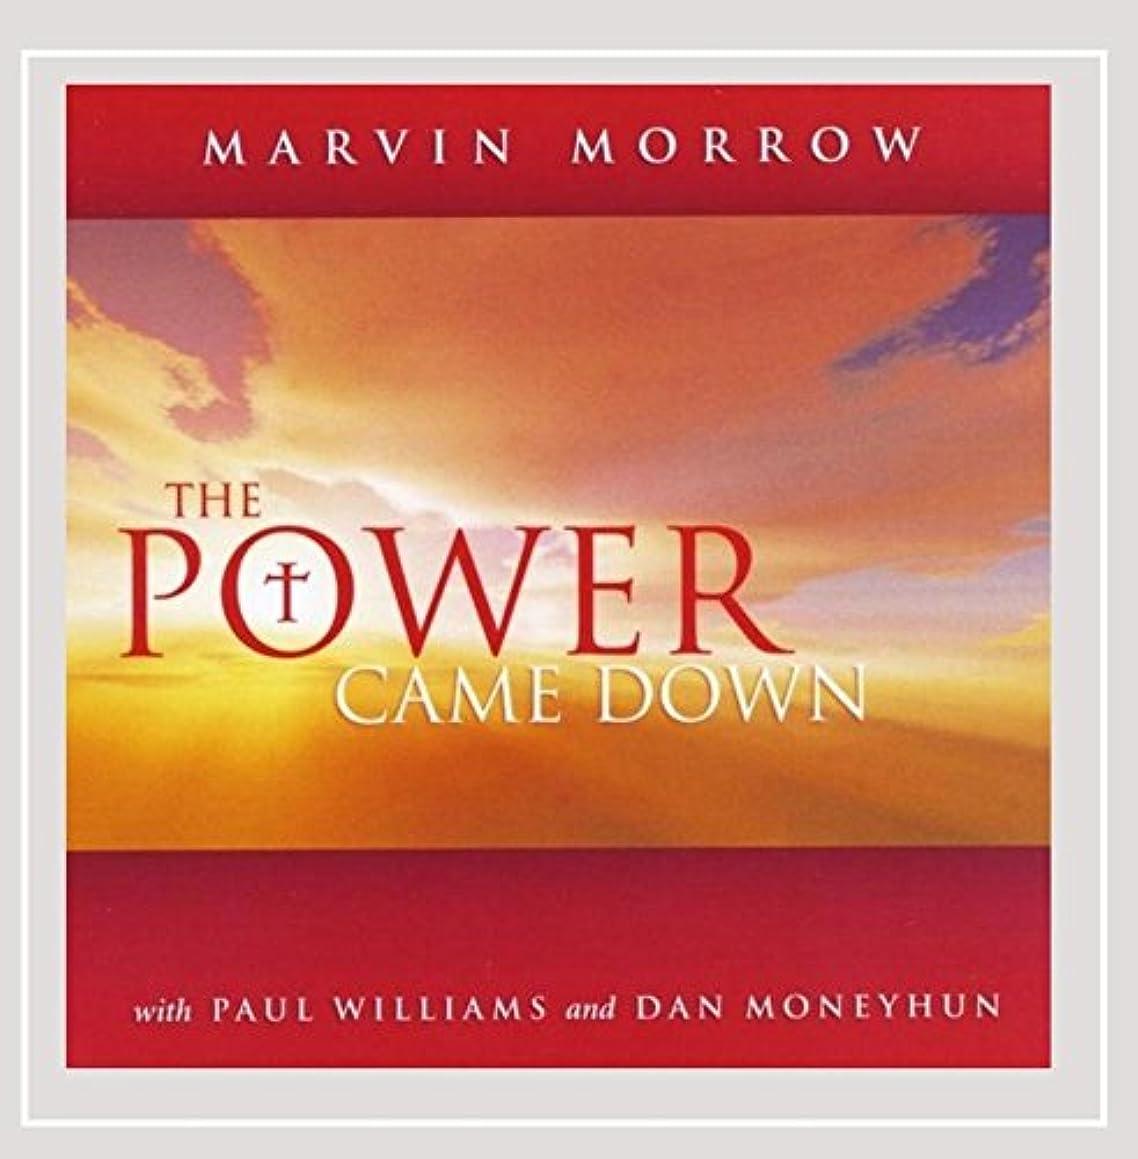 The Power Came Down feat. Dan Moneyhun & Paul Williams